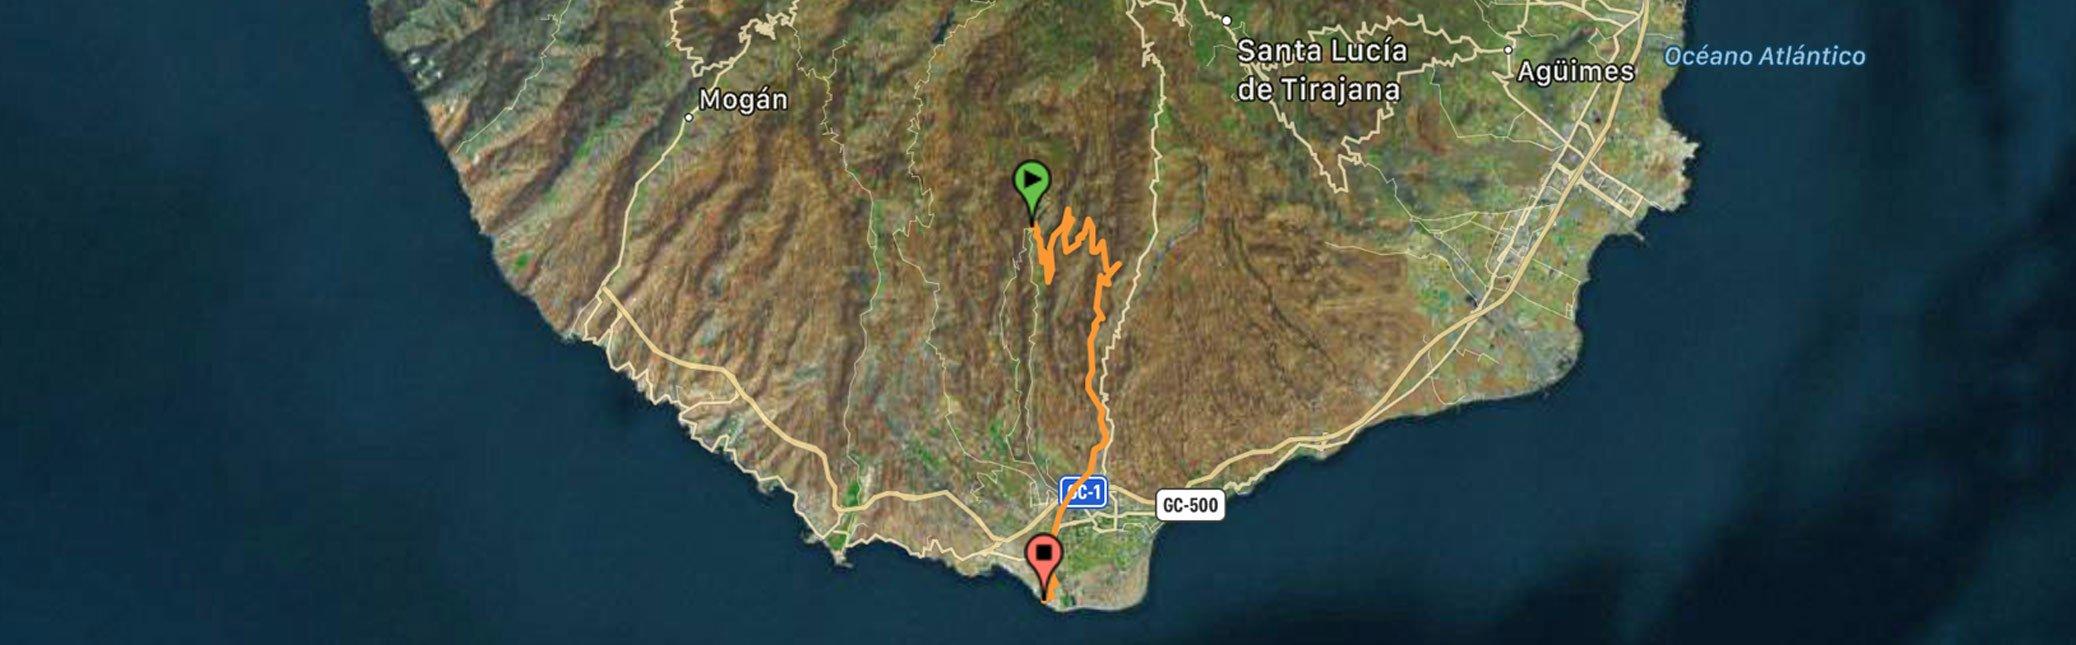 Grand Canyon - Gran Canaria-mountain Bike Tour - track